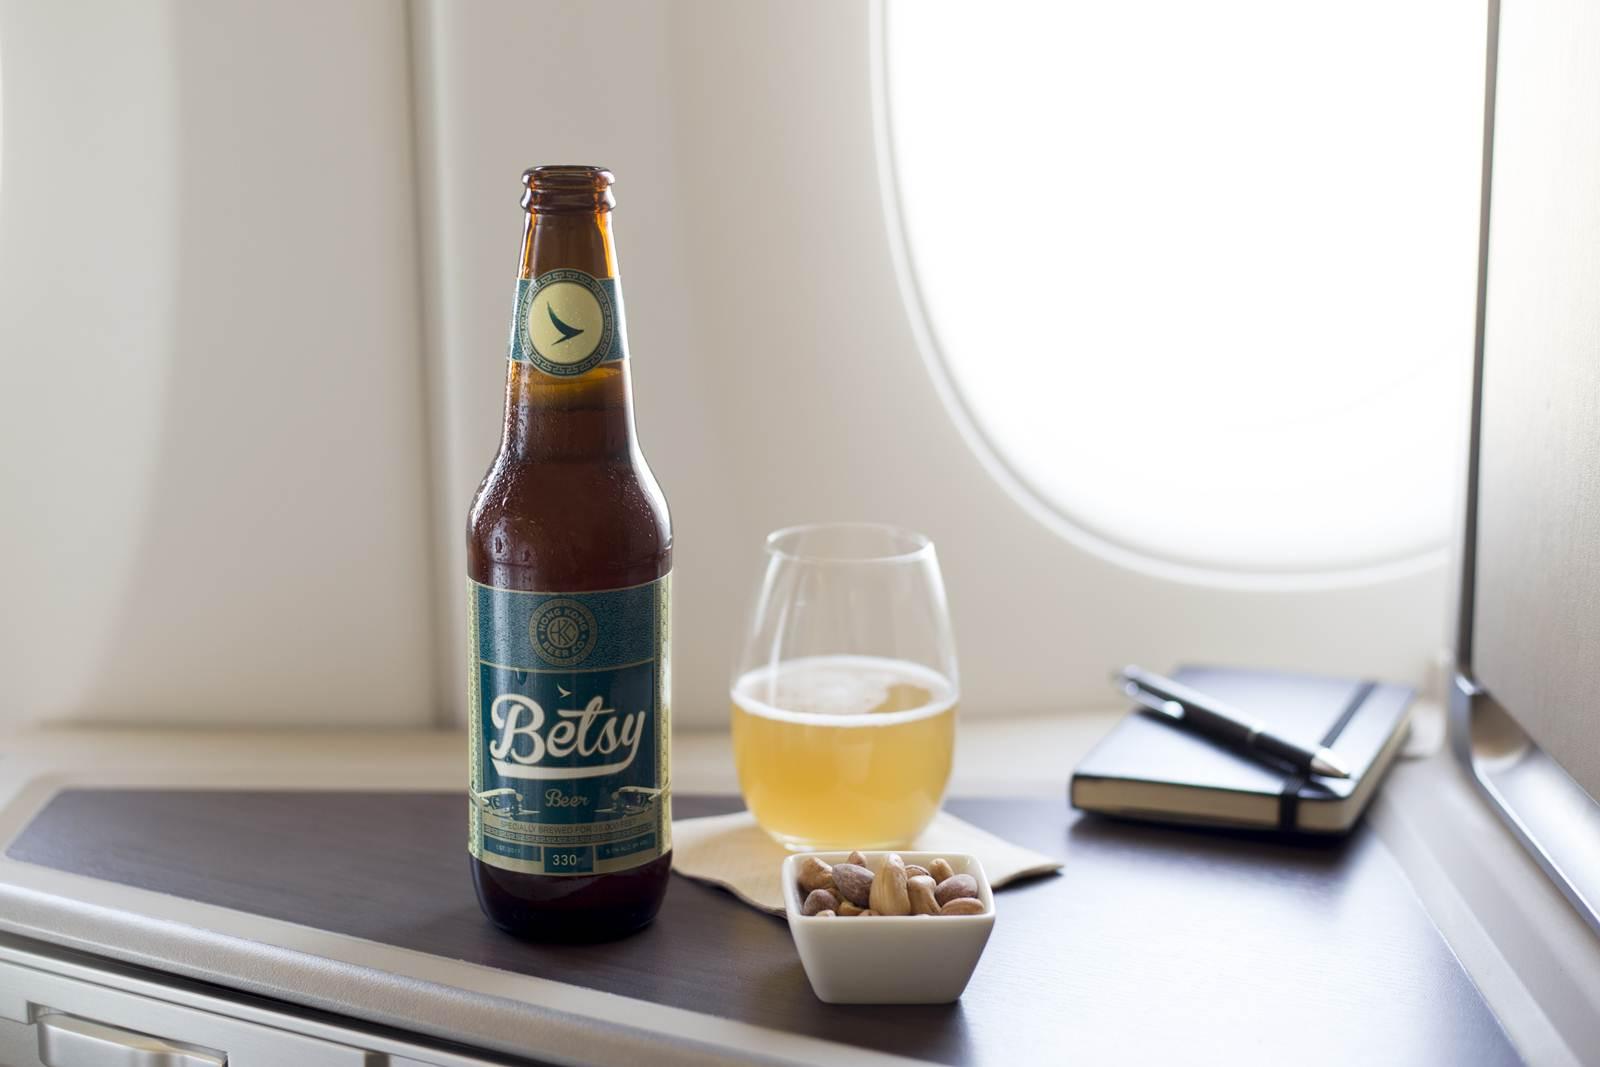 Cerveja Betsy da cathay Pacific desenvolvida para altas altitudes